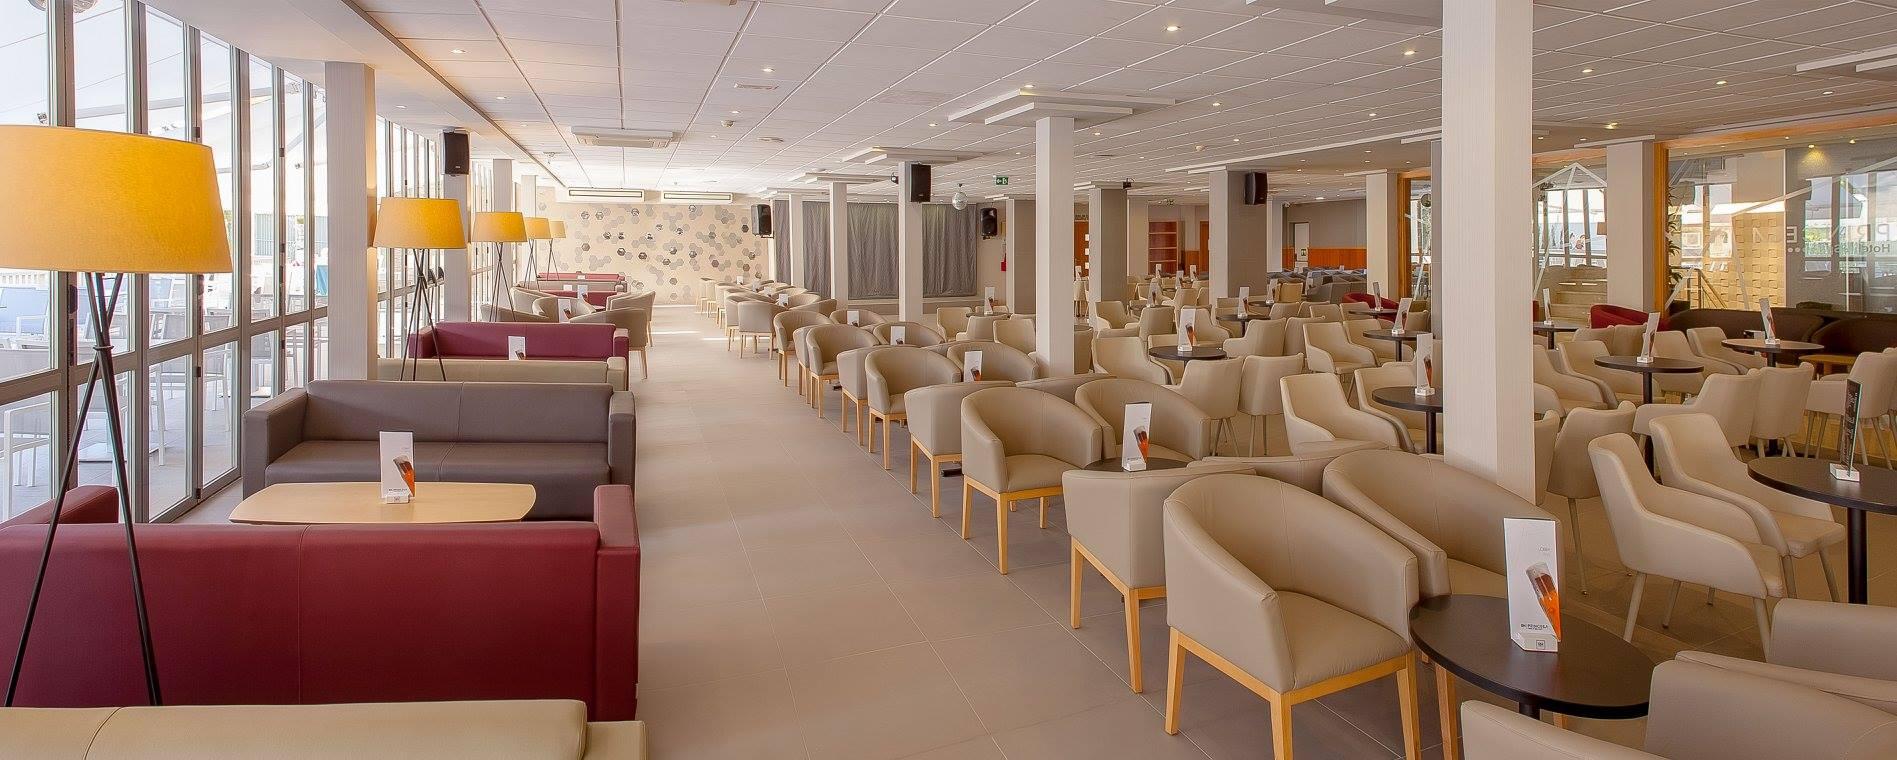 hotel princesa benidorm-mega mobiliario3